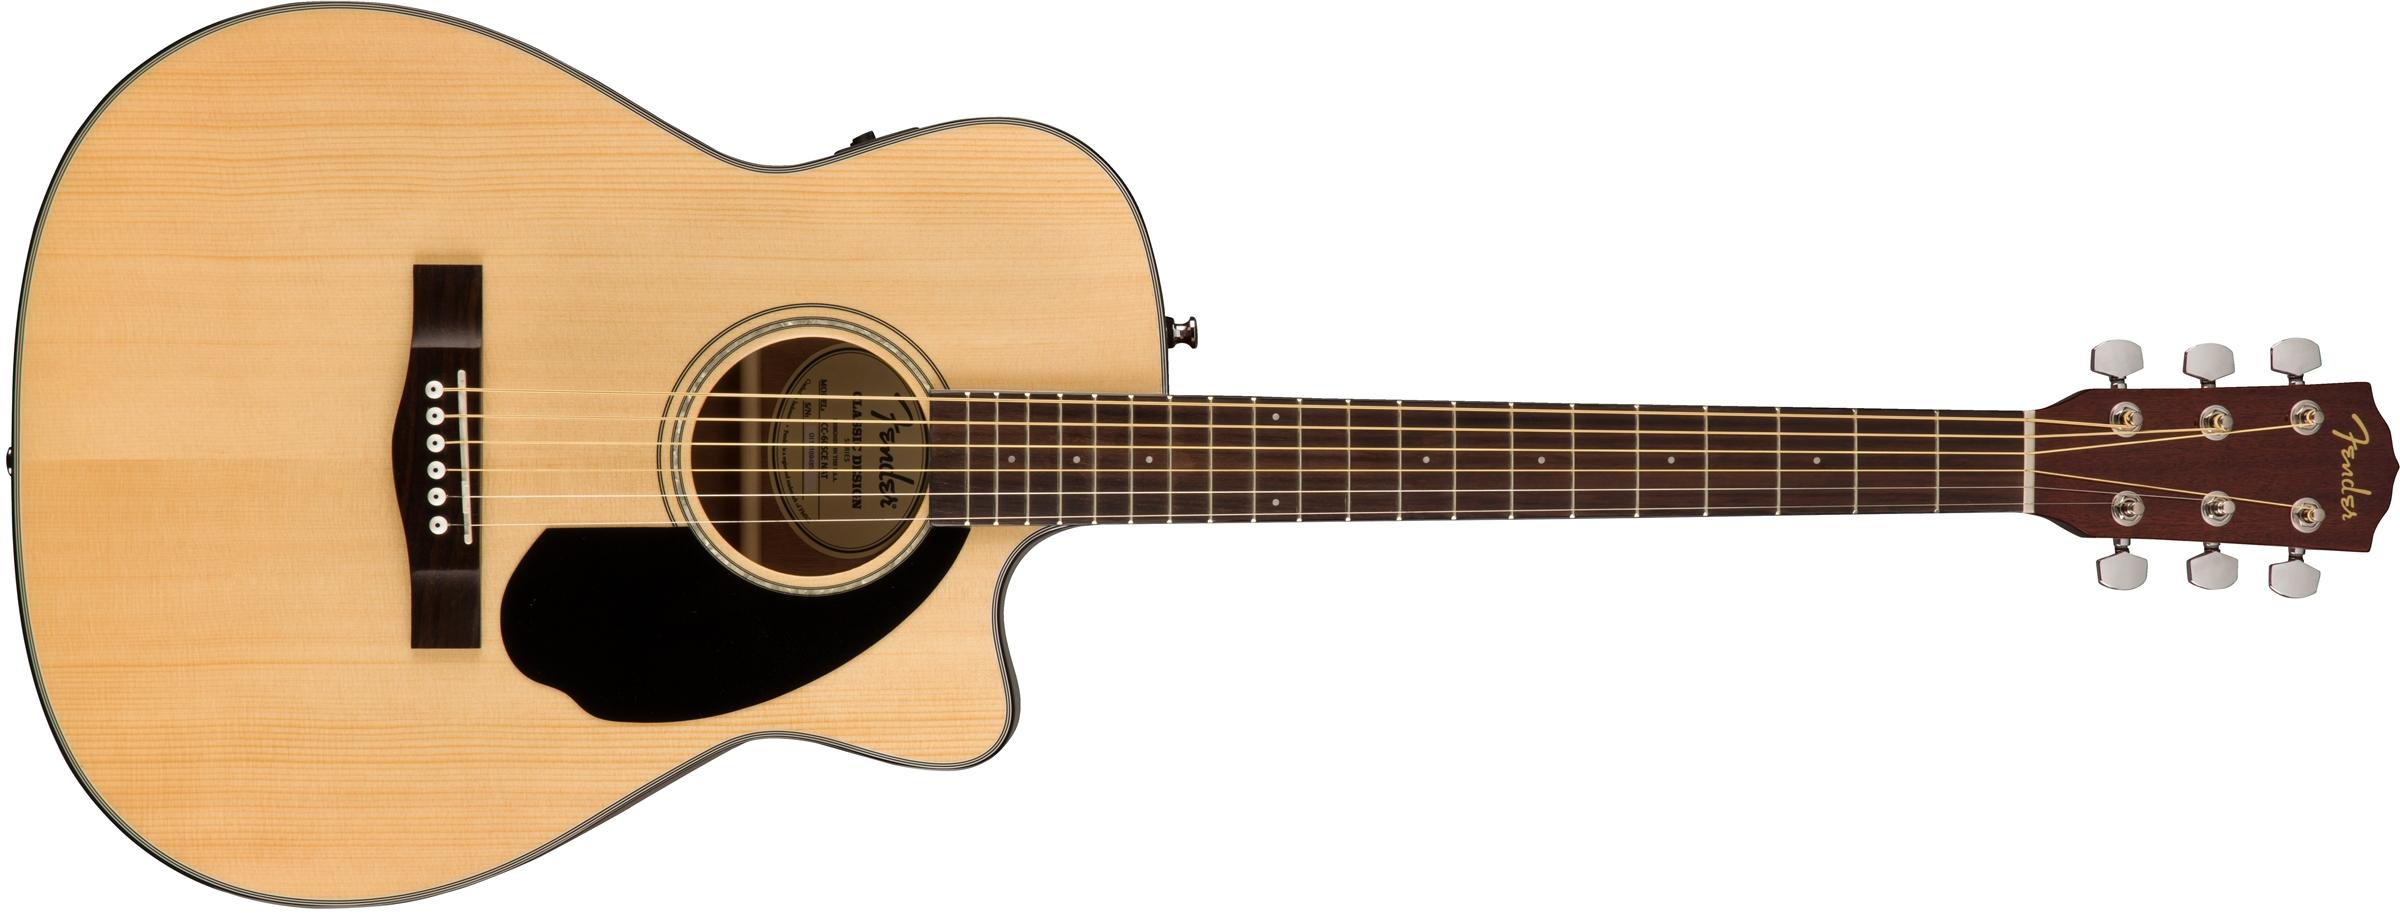 Vintage Yamaha Acoustic Guitar Parts